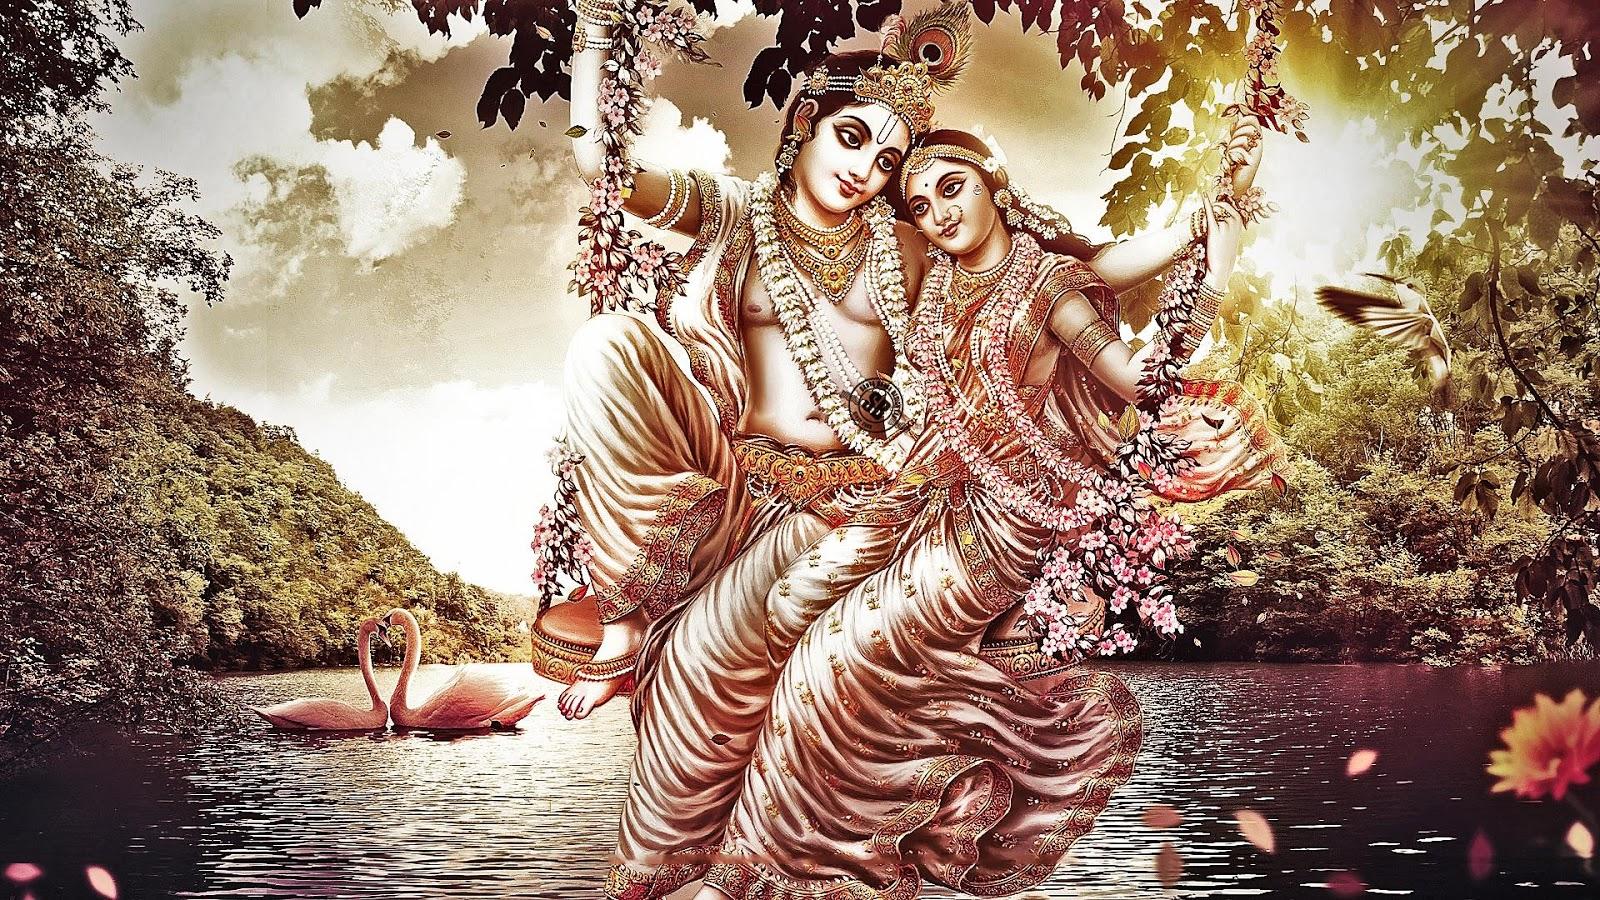 Music Wallpaper Hd Apk Download: Hindu God HD Wallpapers 1.0 APK Download